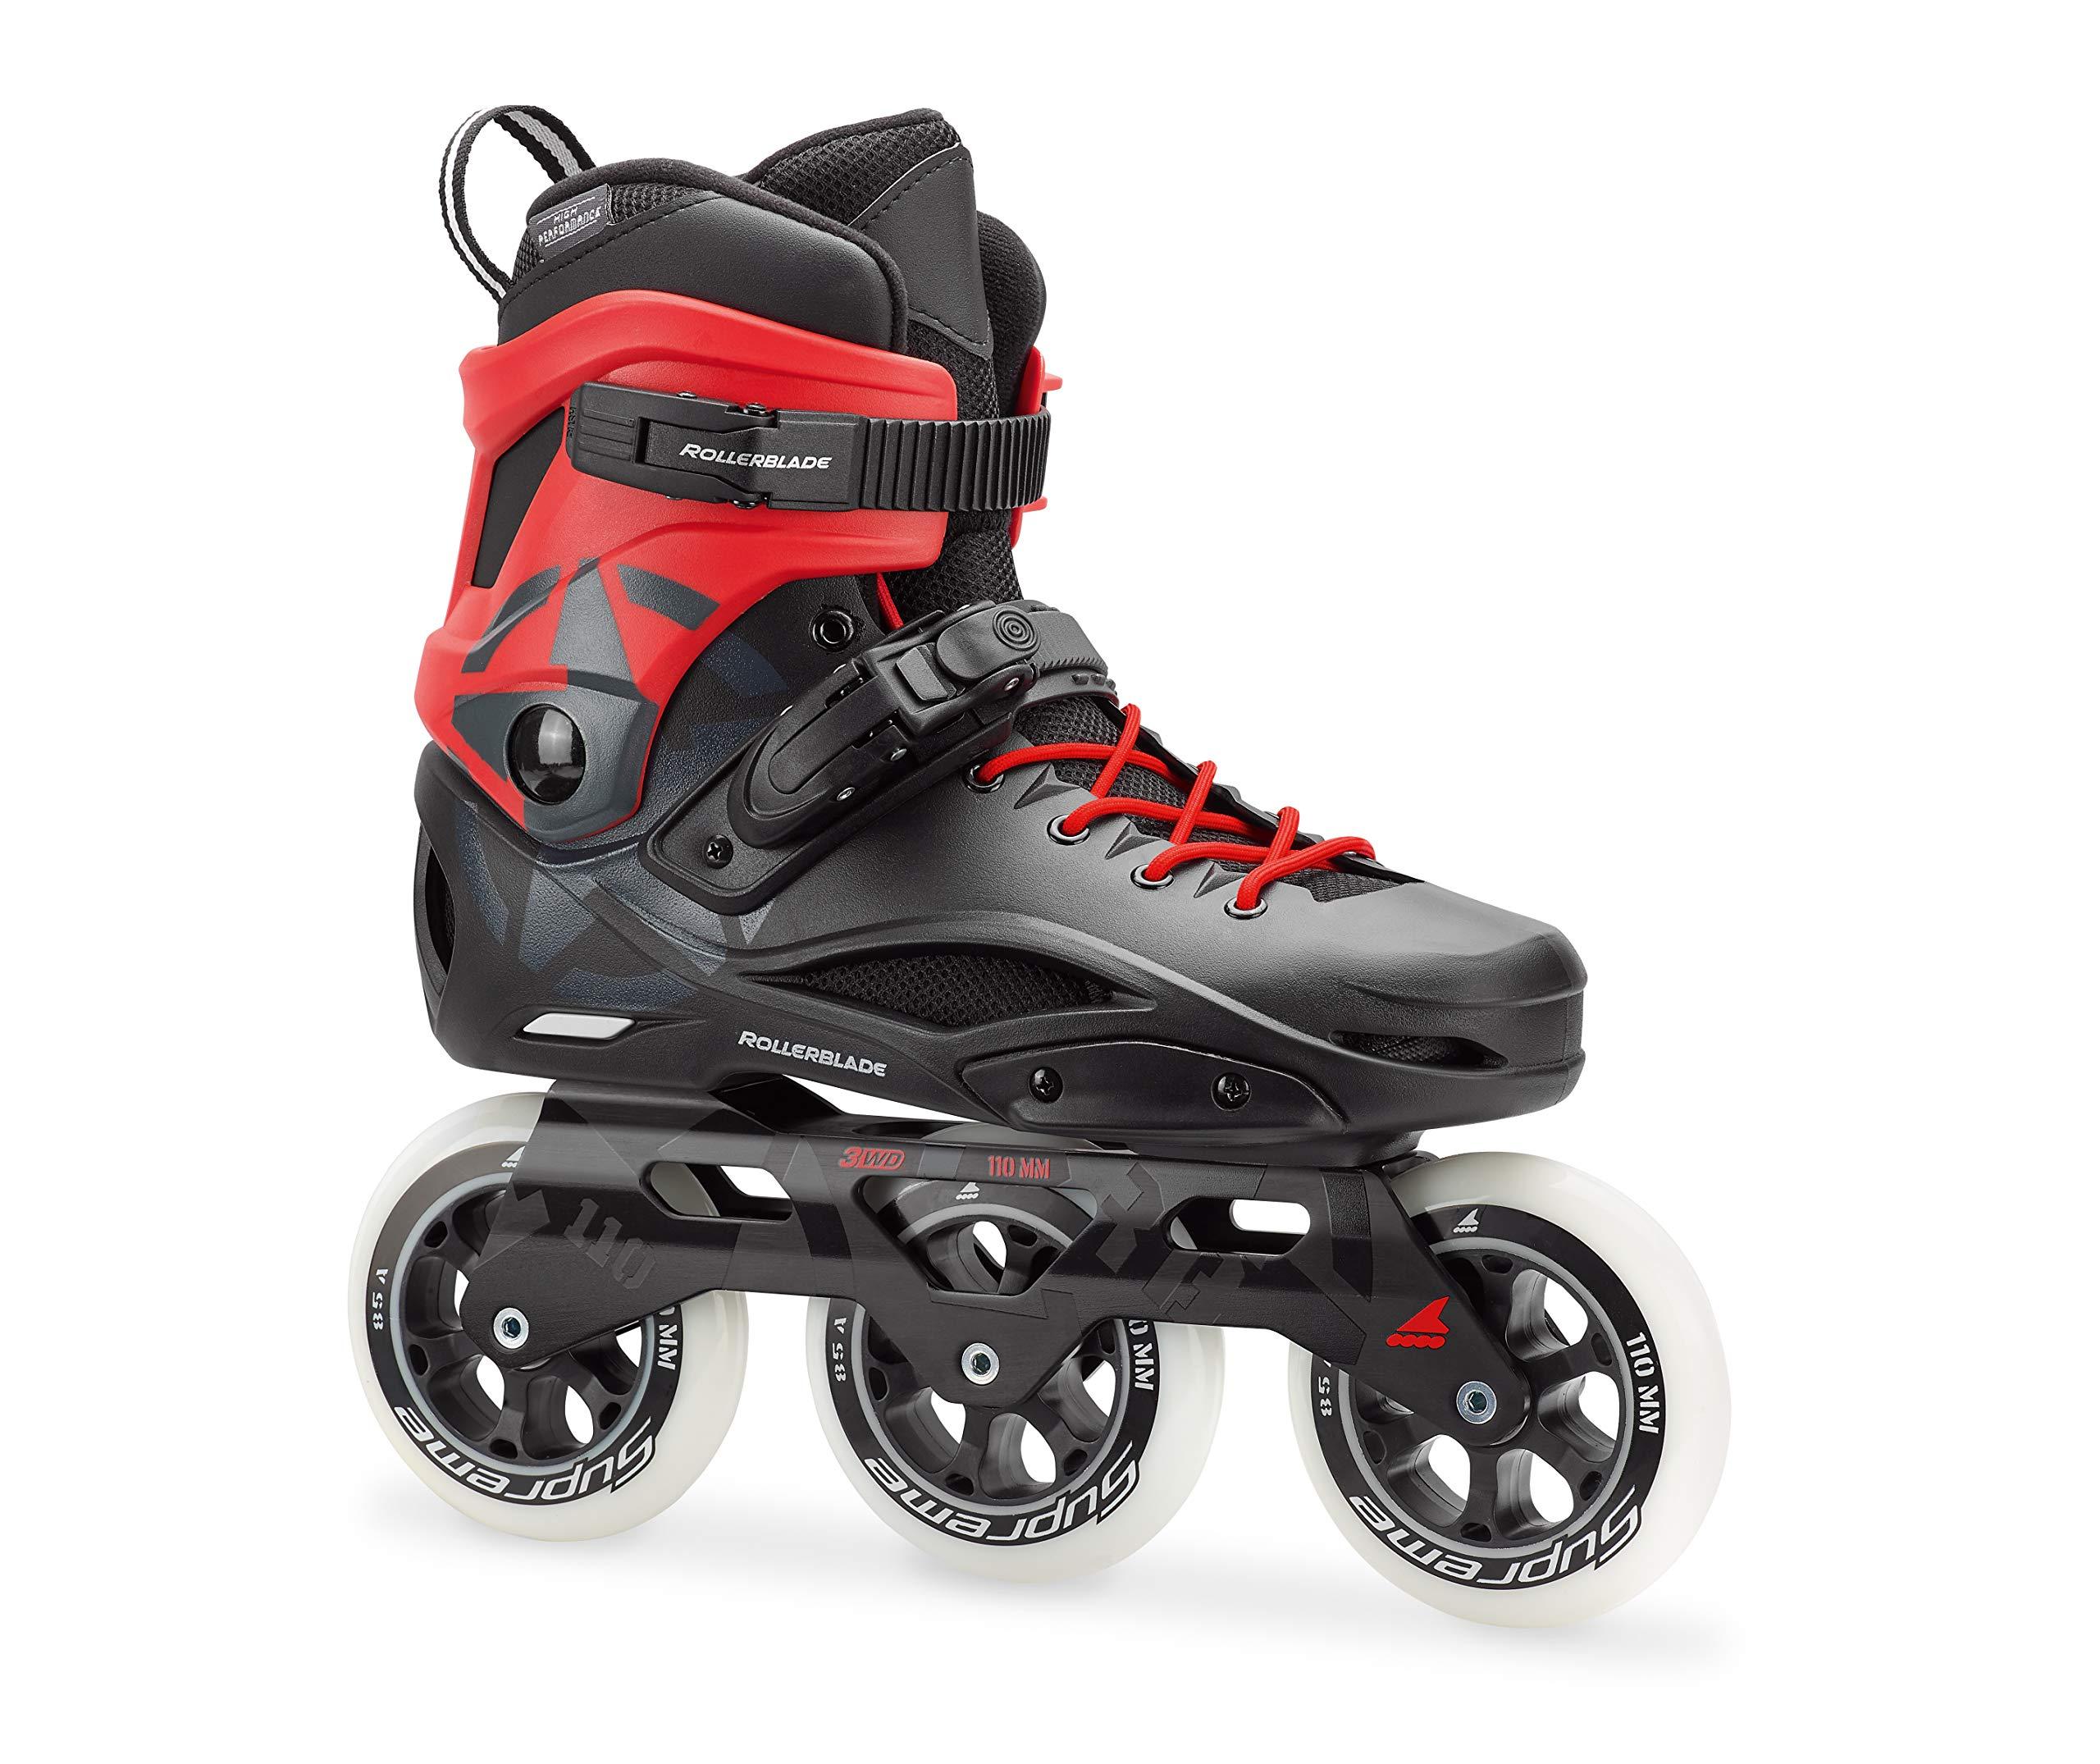 Rollerblade Men's 110 3Wd Fitness Inline Skate, Black/Red, Size 11